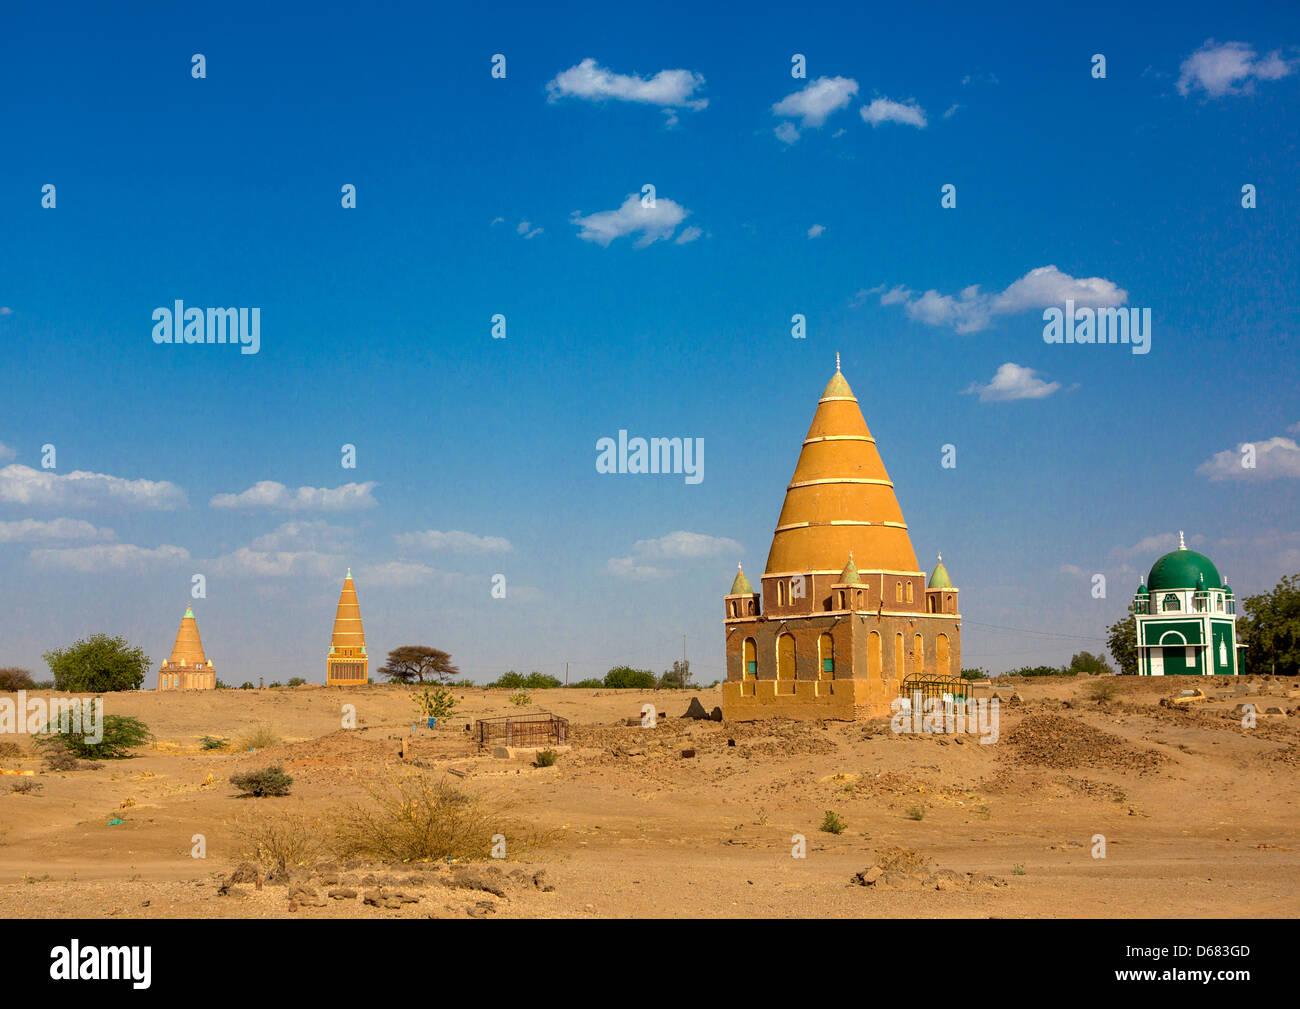 Sufi Shrine, Abu Haraz, Sudan - Stock Image